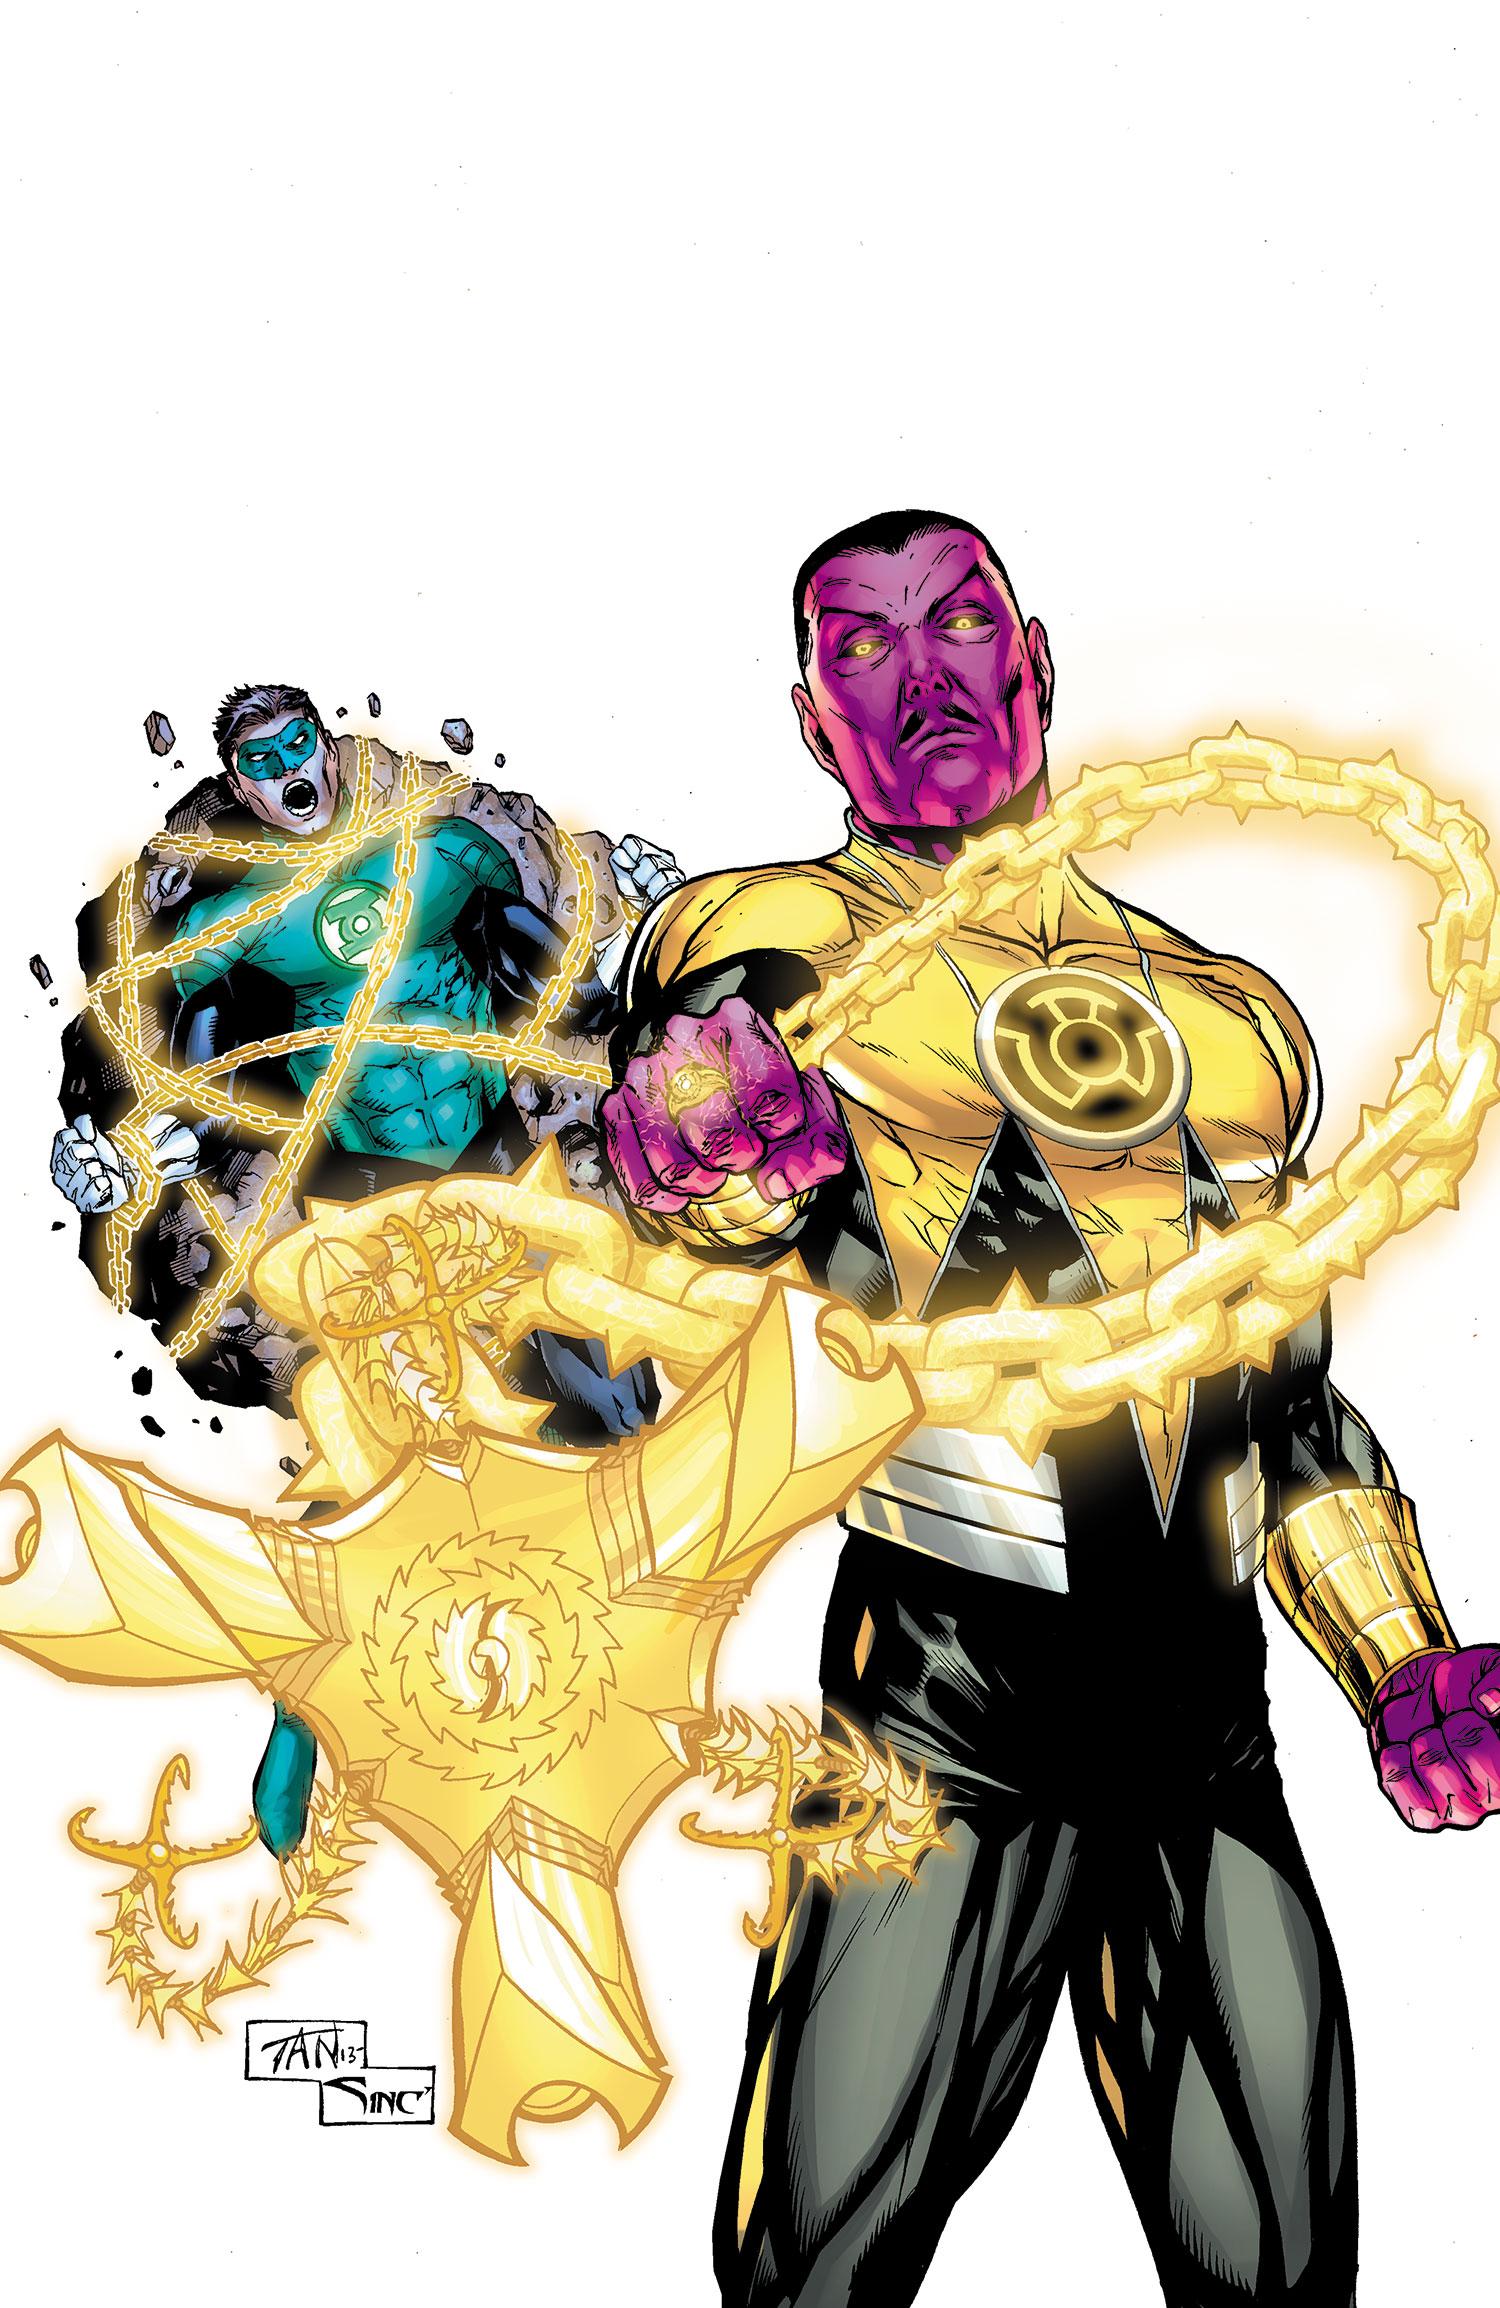 Thaal Sinestro (Terra Primal)